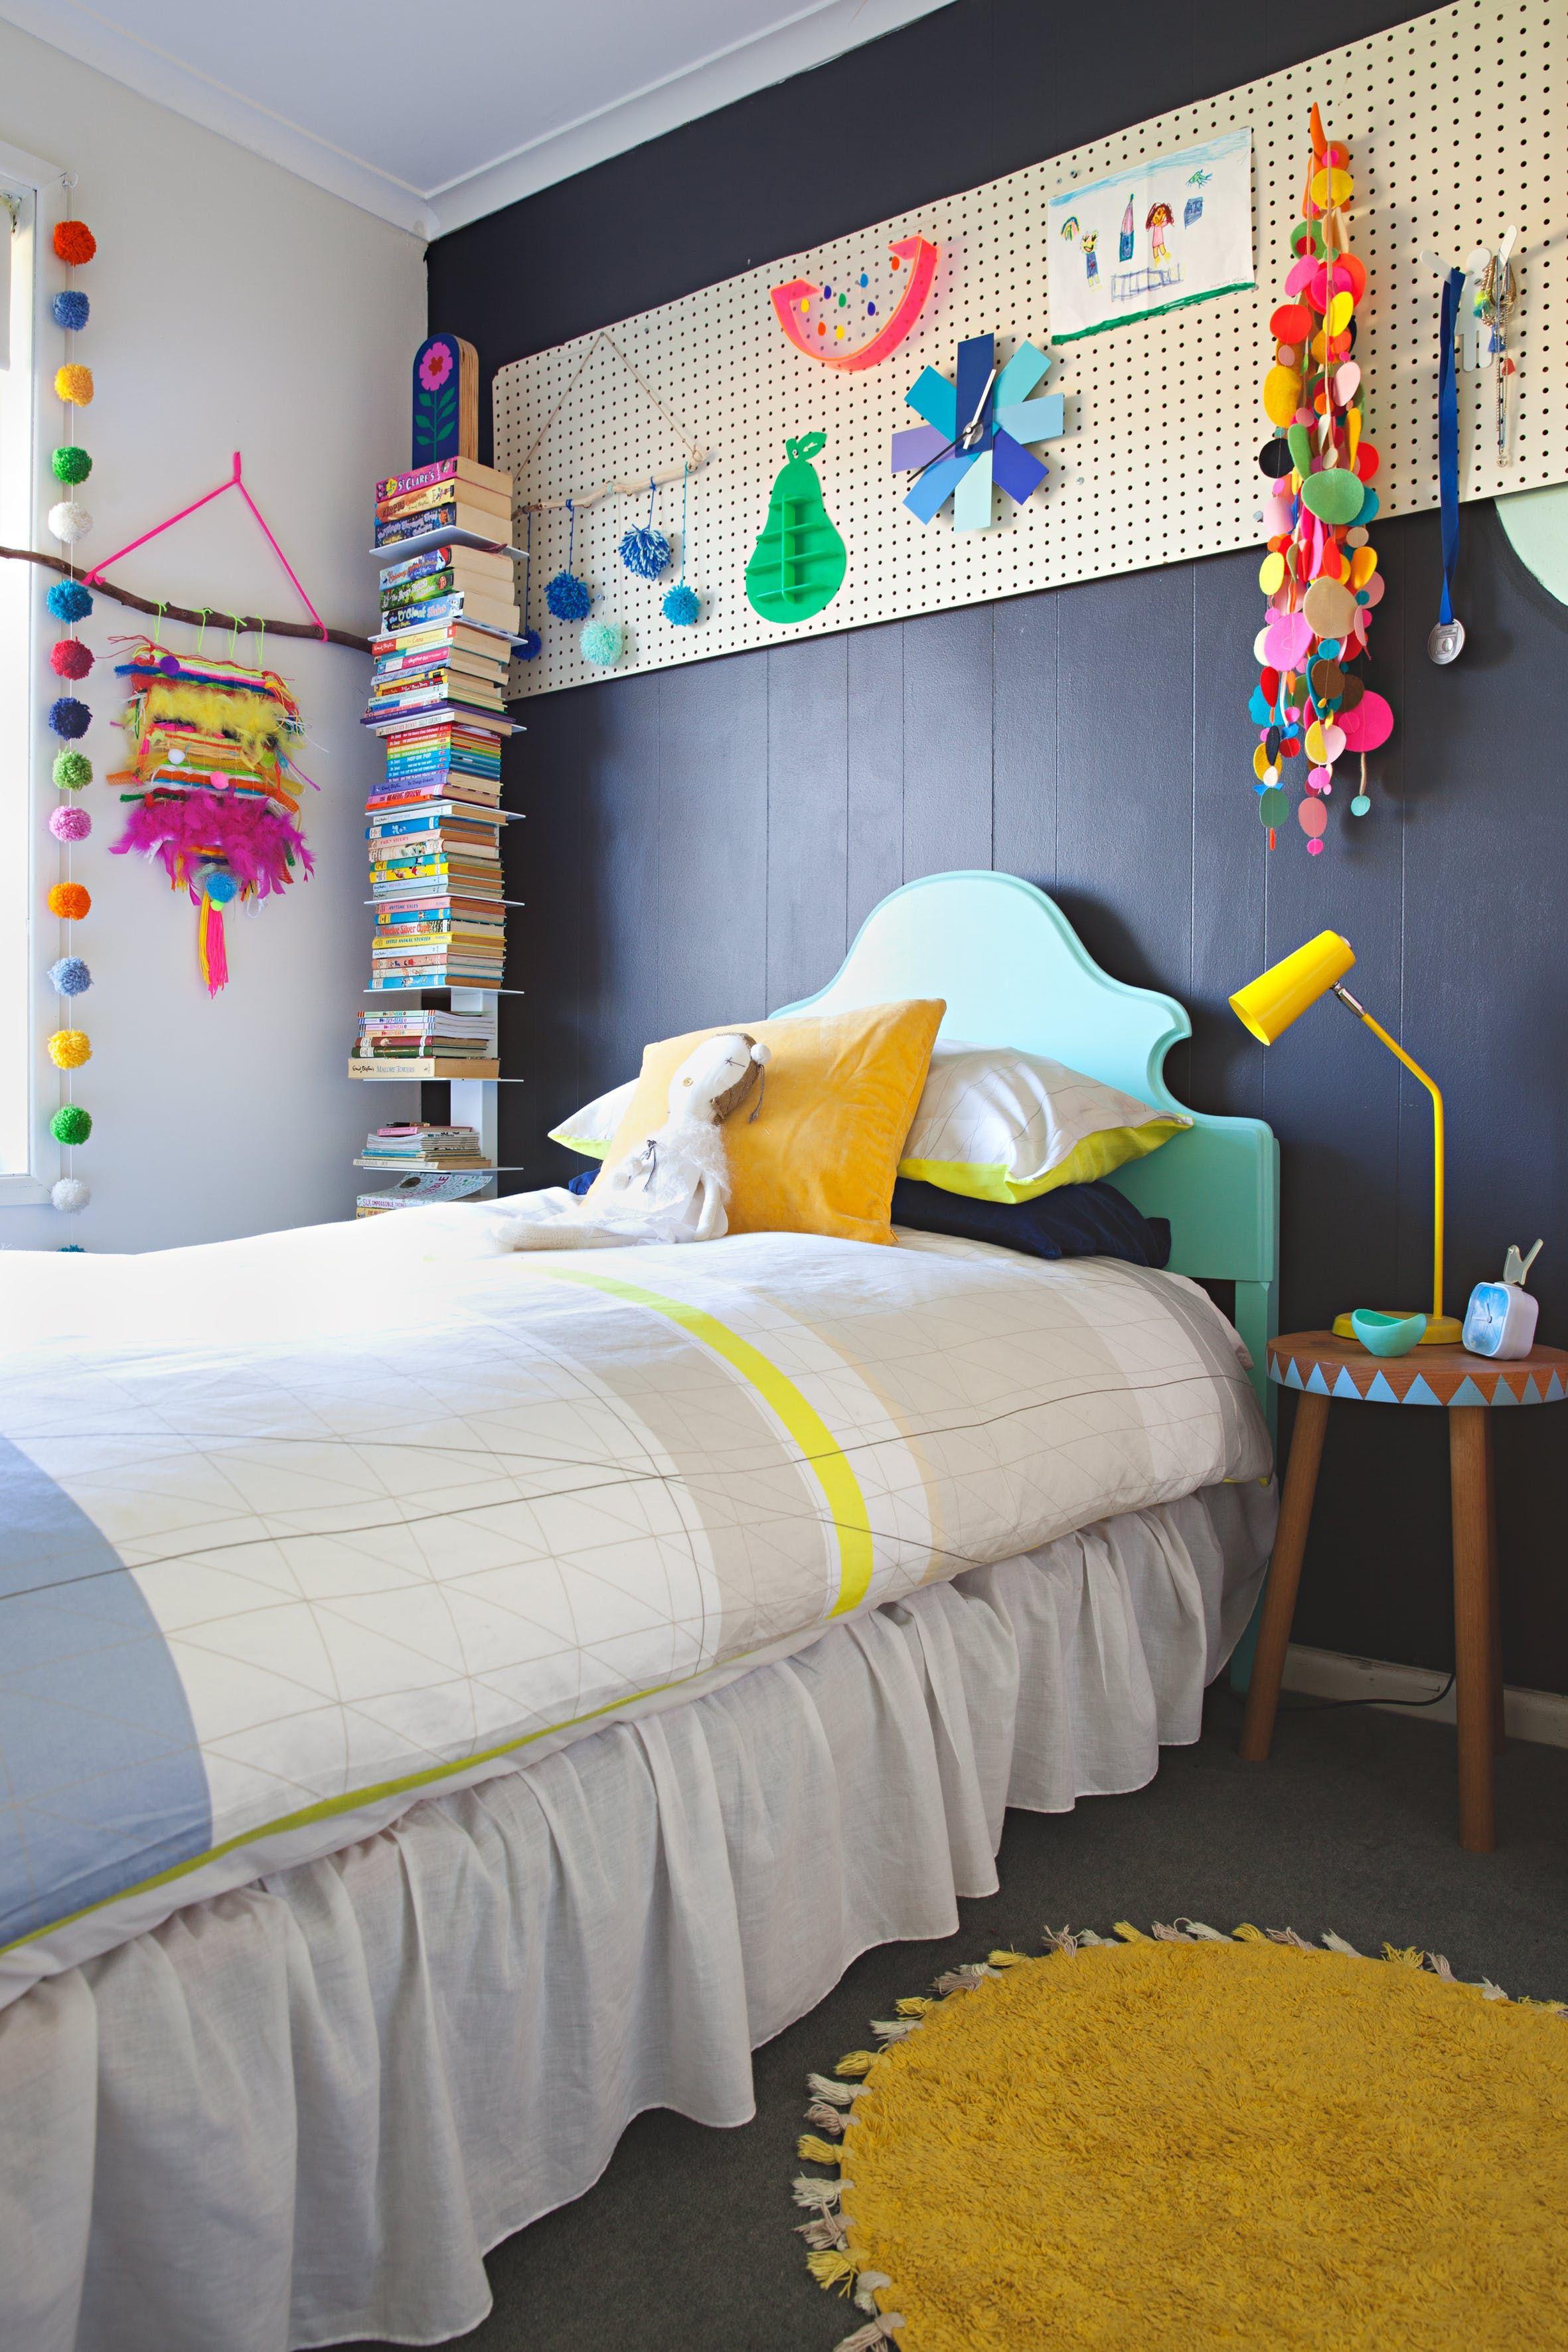 Luxury Kids Room: Little Kids, Big Style: Our Favorite Kids Rooms